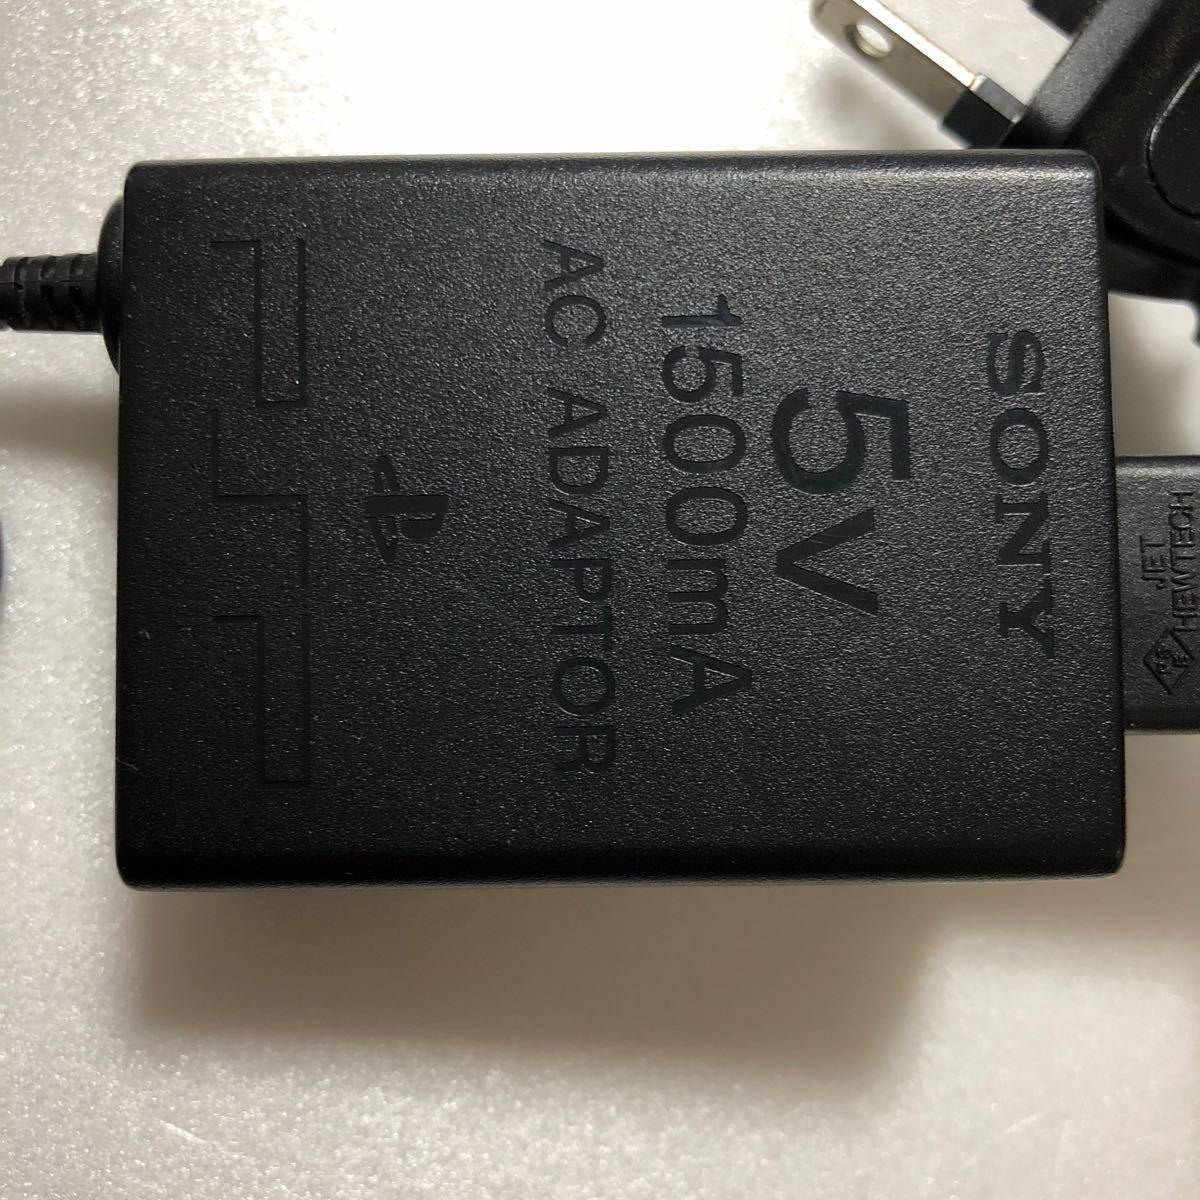 PSP3000本体 純正ACアダプター 動作確認済み SONY グリーン PSP-3000 プレイステーションポータブル